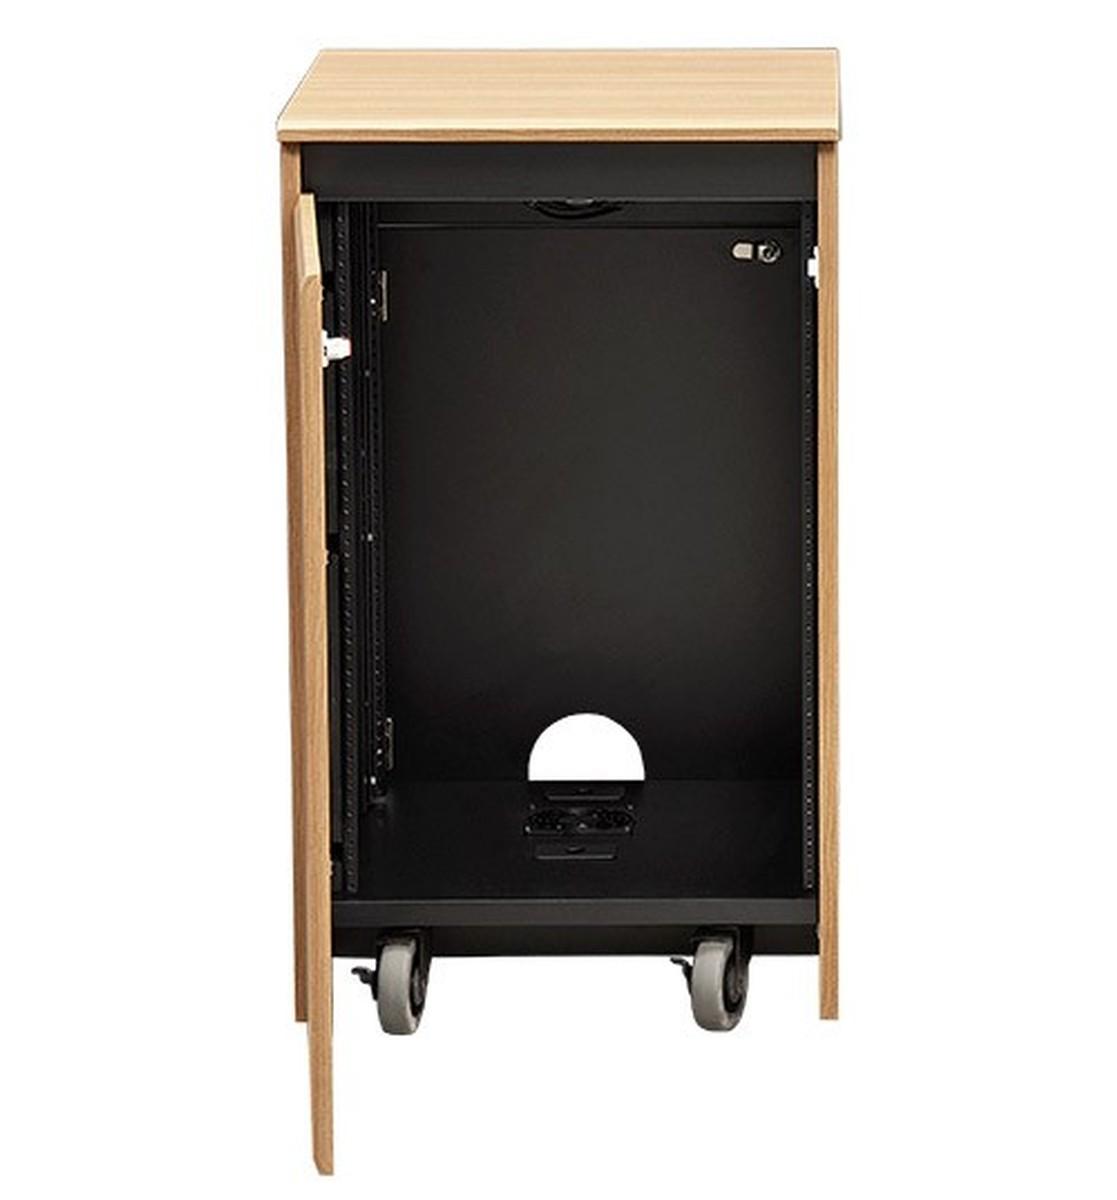 Avf cr1016ex rolling 16ru wood equipment rack 12 color for Avf furniture